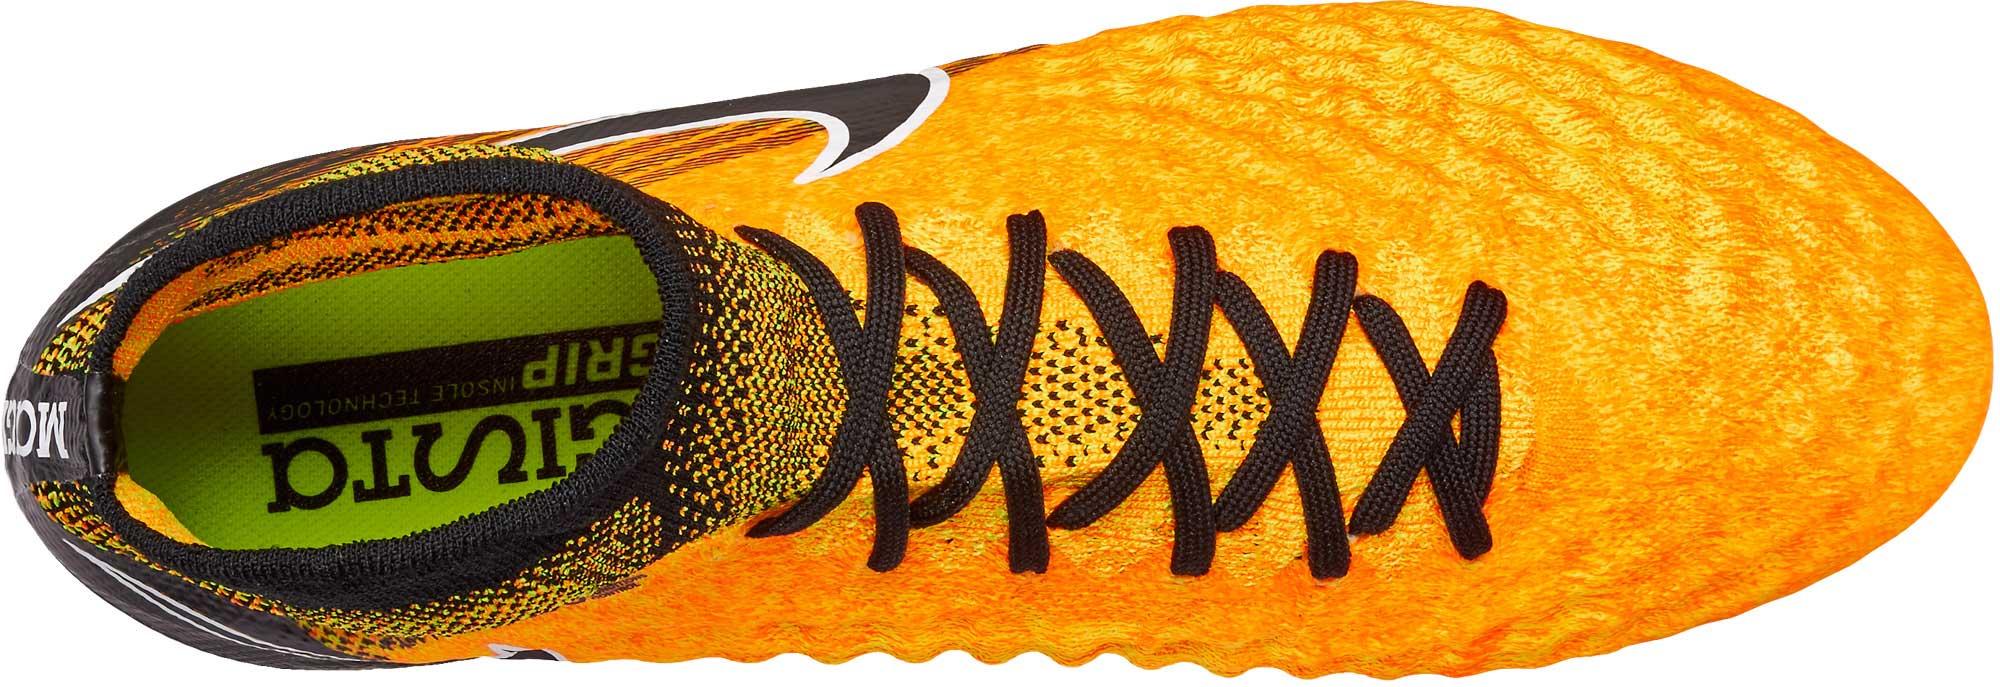 New Nike Magista Obra II SG Pro 11 Soccer Cleats Pinterest